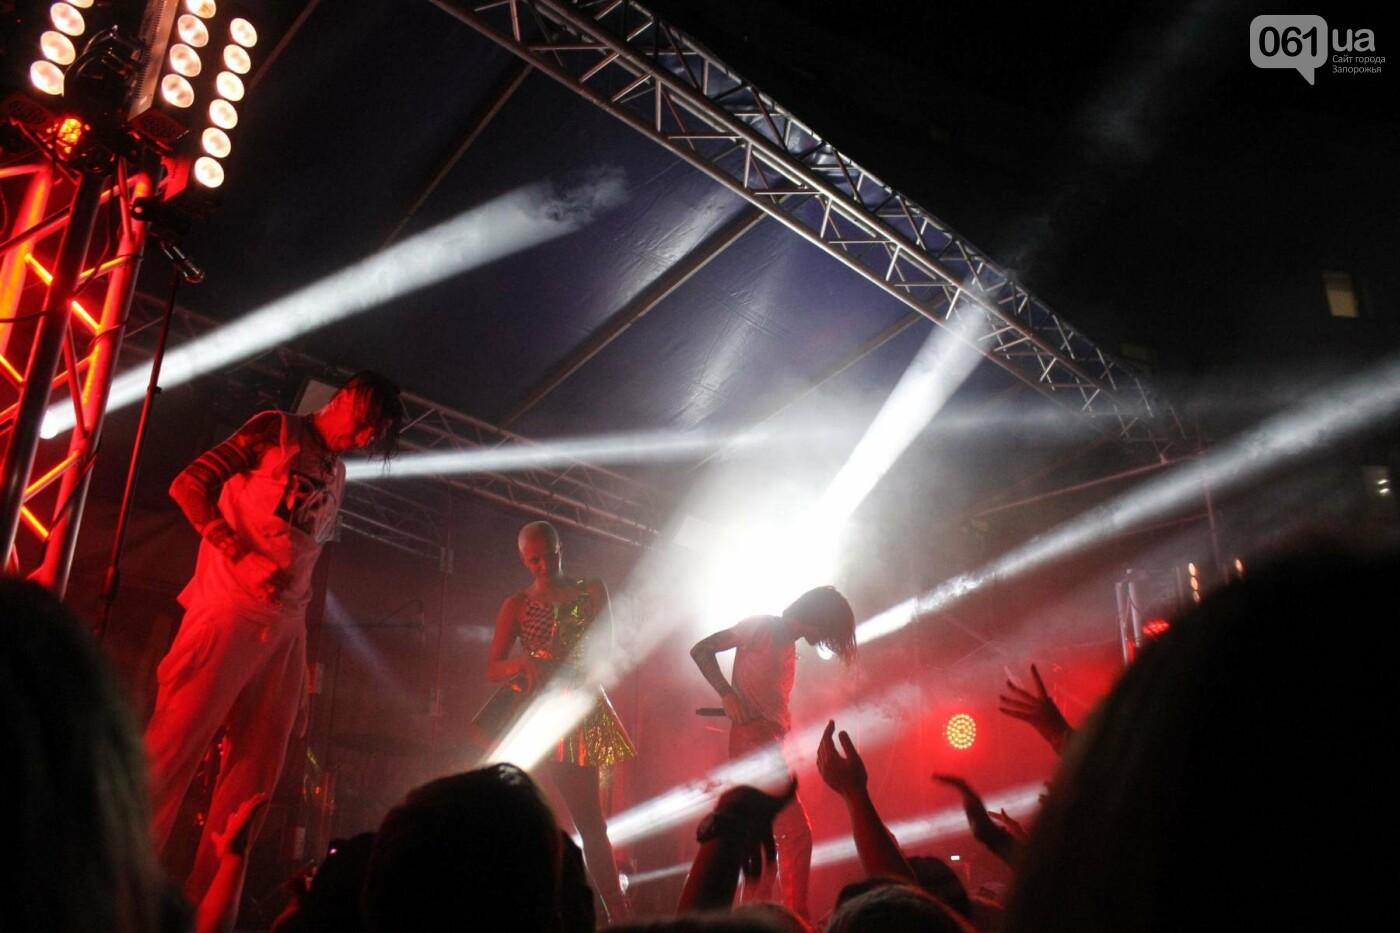 ALEKSEEV, «Агонь» и MamaRika: в Запорожье звезды устроили яркий концерт на «Miss AVRORA Summer 2018», – ФОТОРЕПОРТАЖ, фото-26